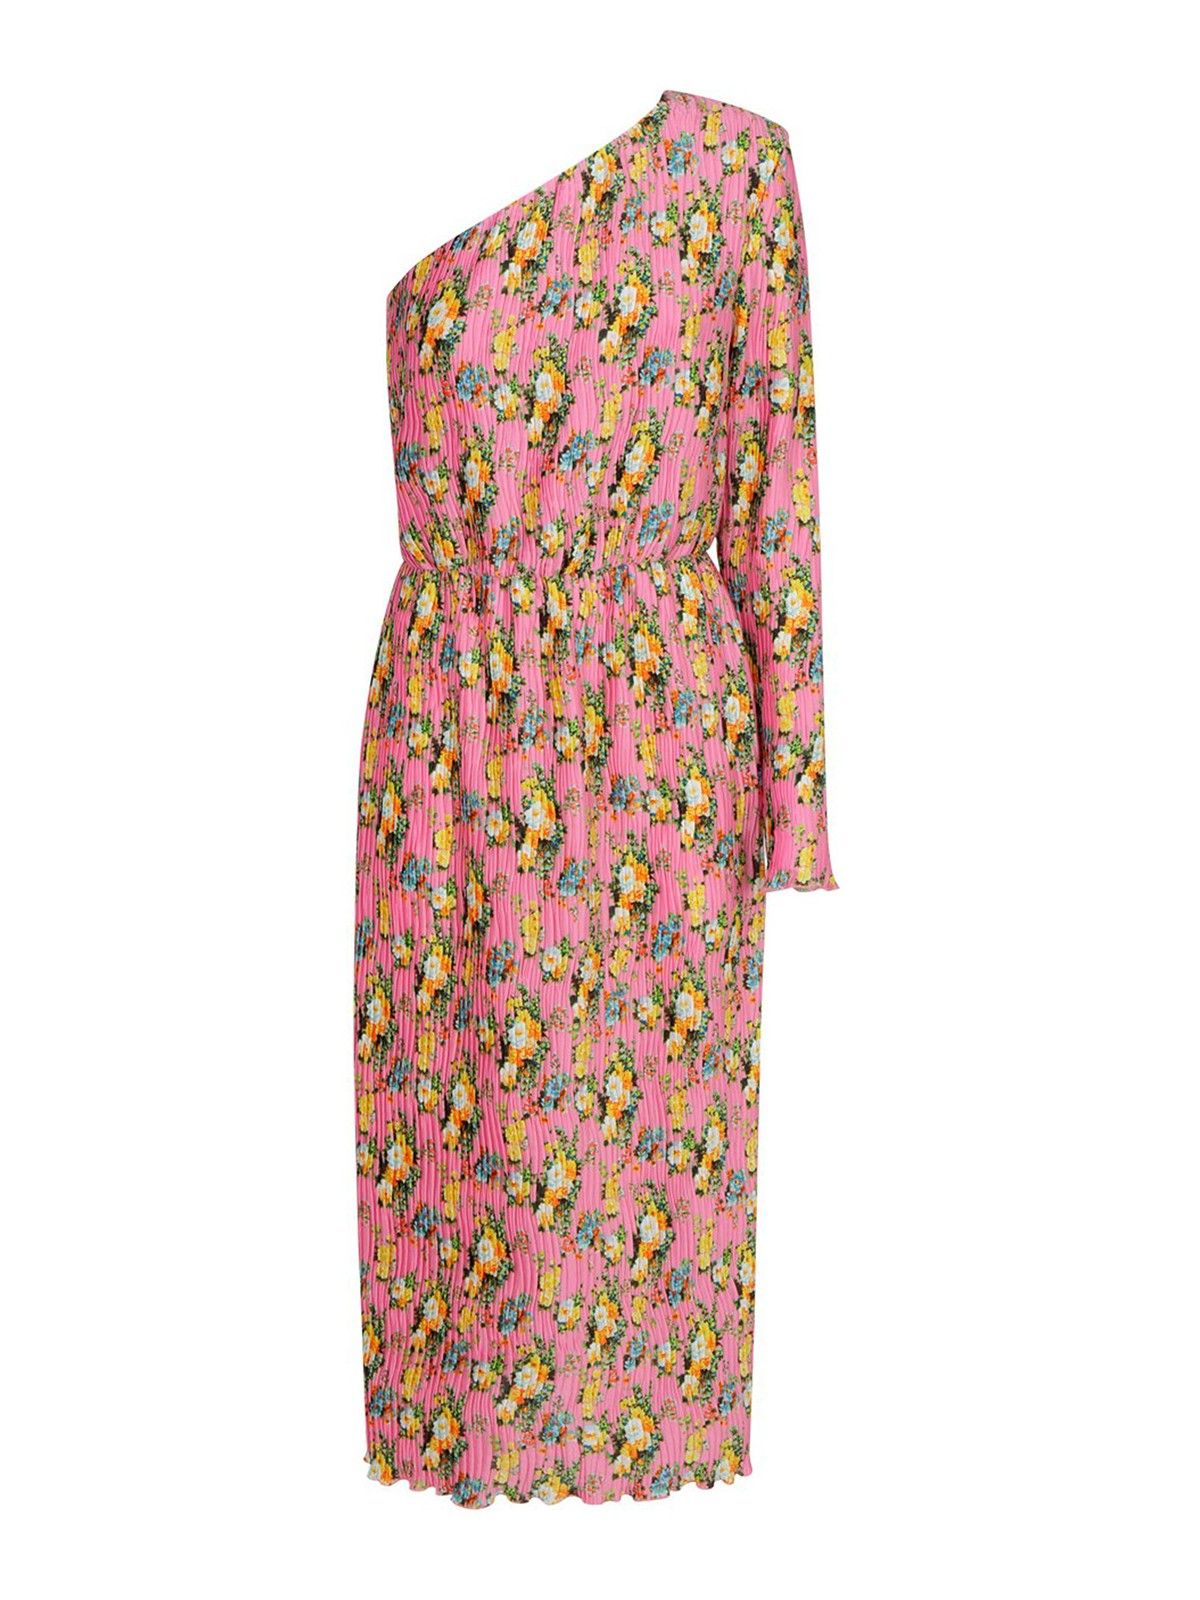 Msgm FLORAL PATTERNED ONE-SLEEVED DRESS